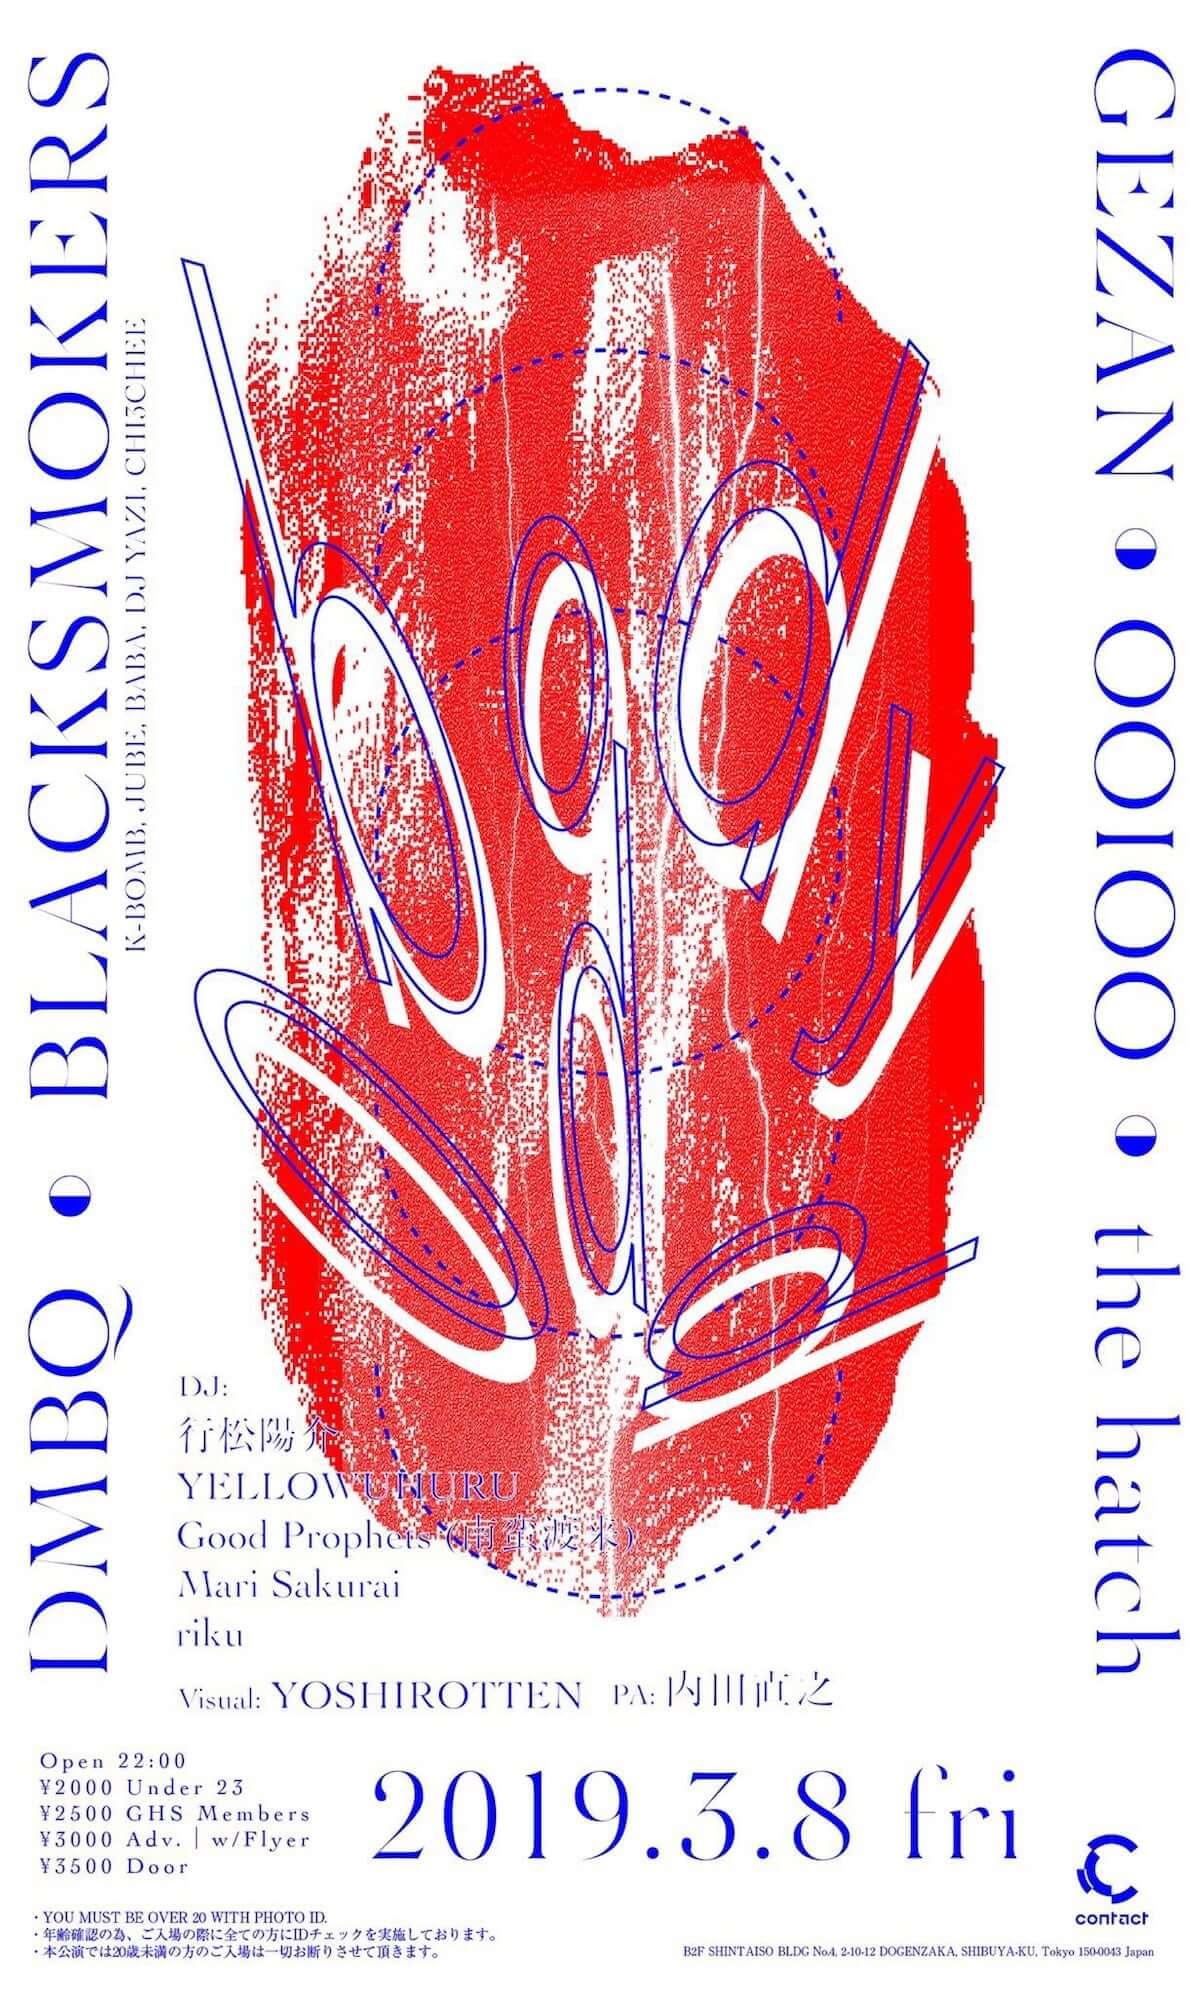 「BODY ODD」が3月に開催|GEZANやthe hatch、BLACKSMOKERS、行松陽介らが登場 music190214-body-odd-1-1200x1996